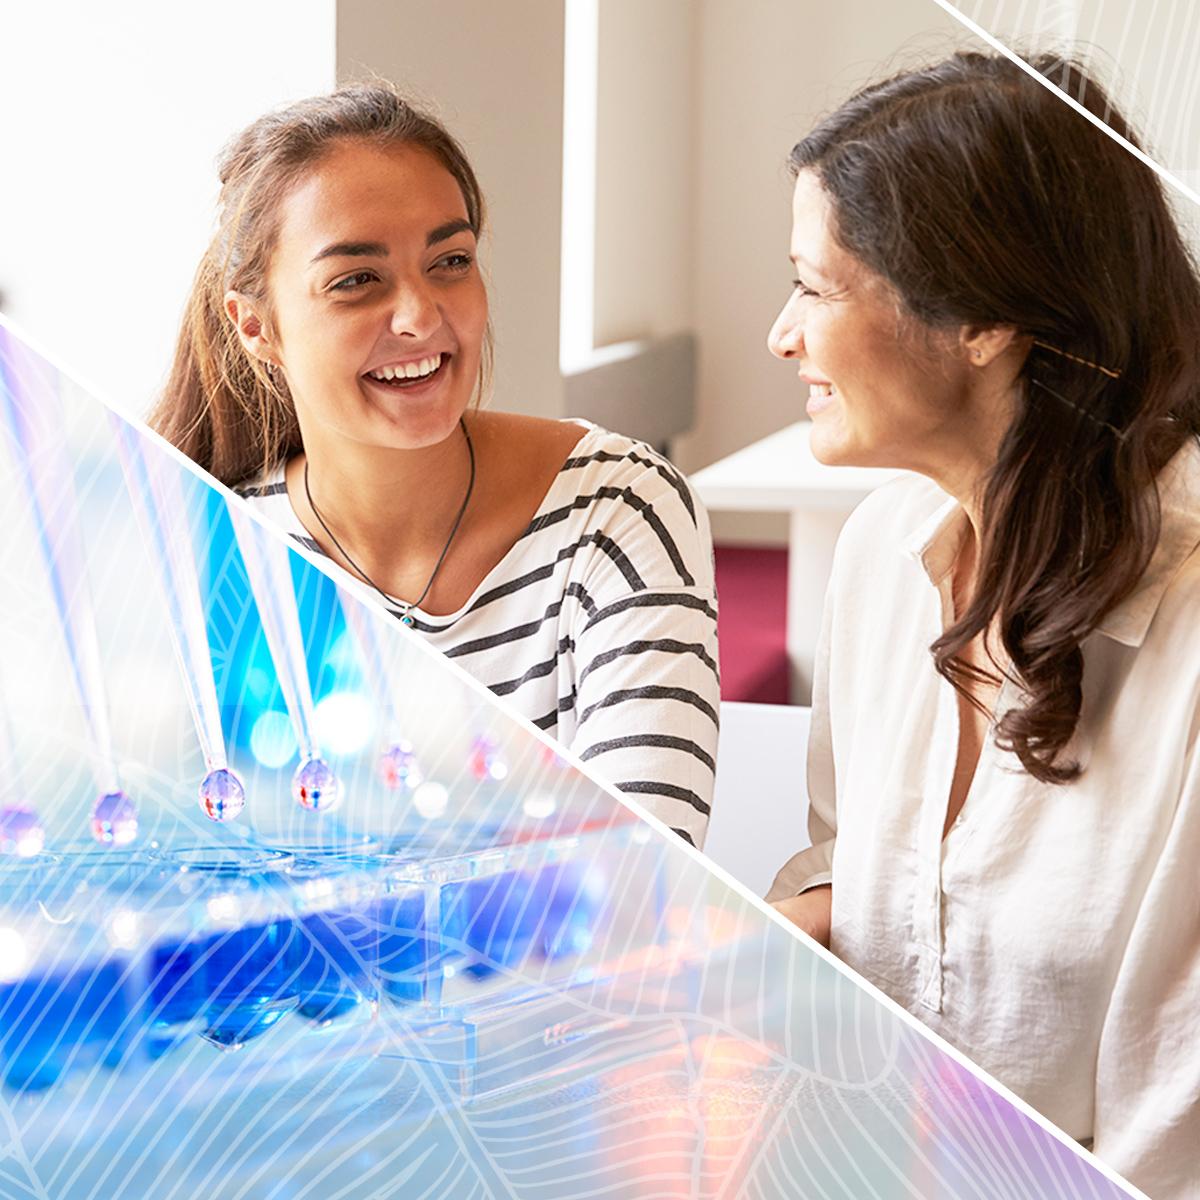 Comparing Medical Schools: 6 Factors Parents of Pre-Med Students Should Keep in Mind Square